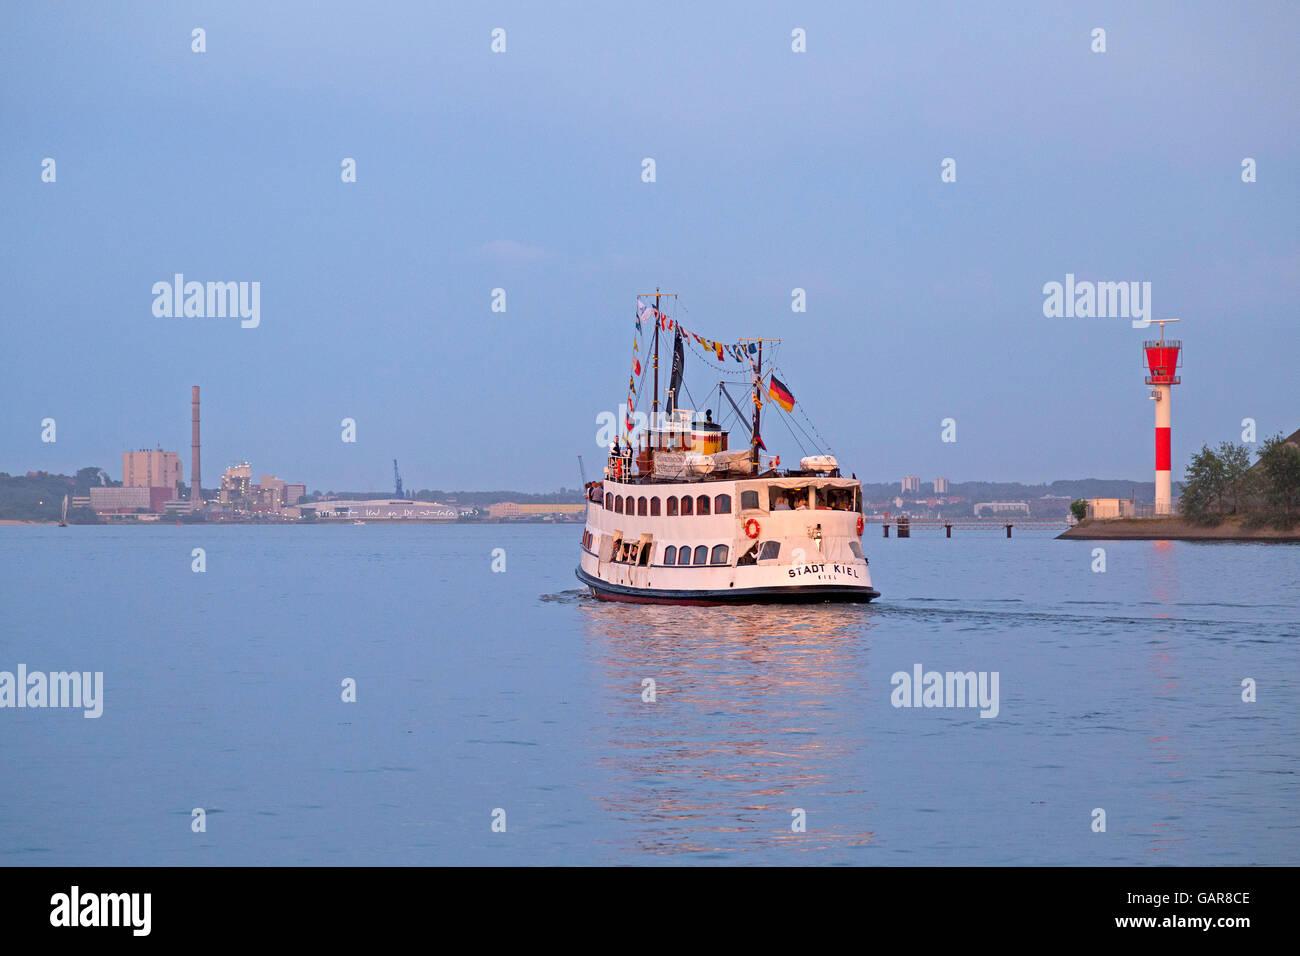 excursion boat, Kiel, Schleswig-Holstein, Germany - Stock Image